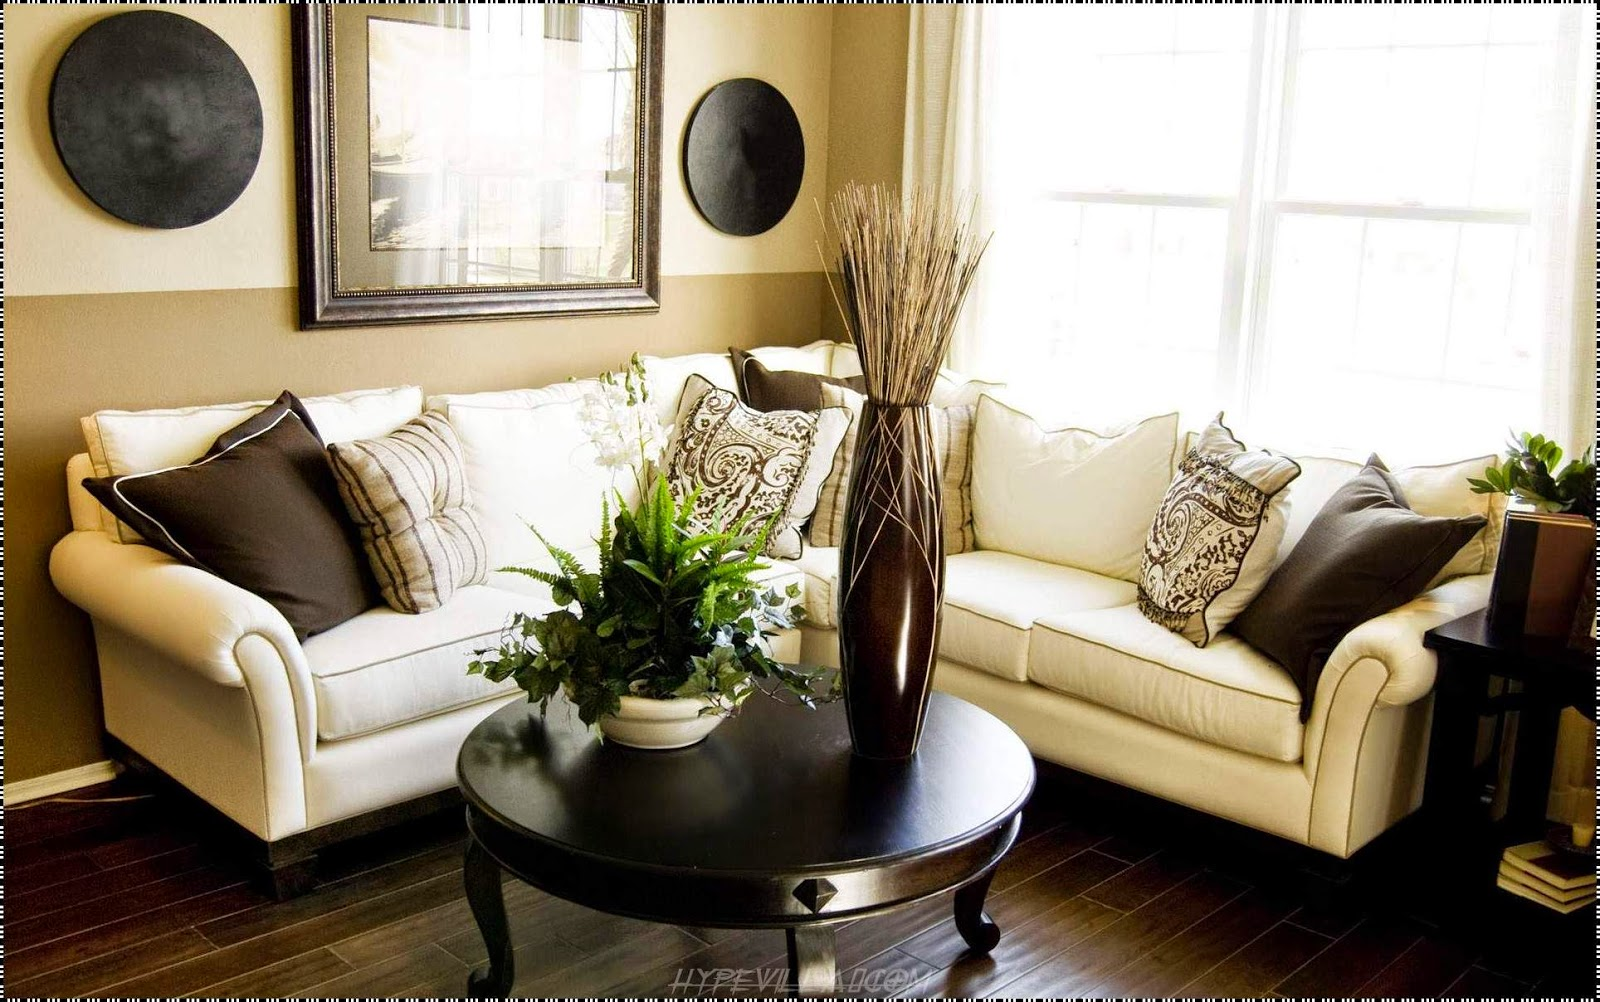 Picturesque Simple Living Room Dining Room Interior Design